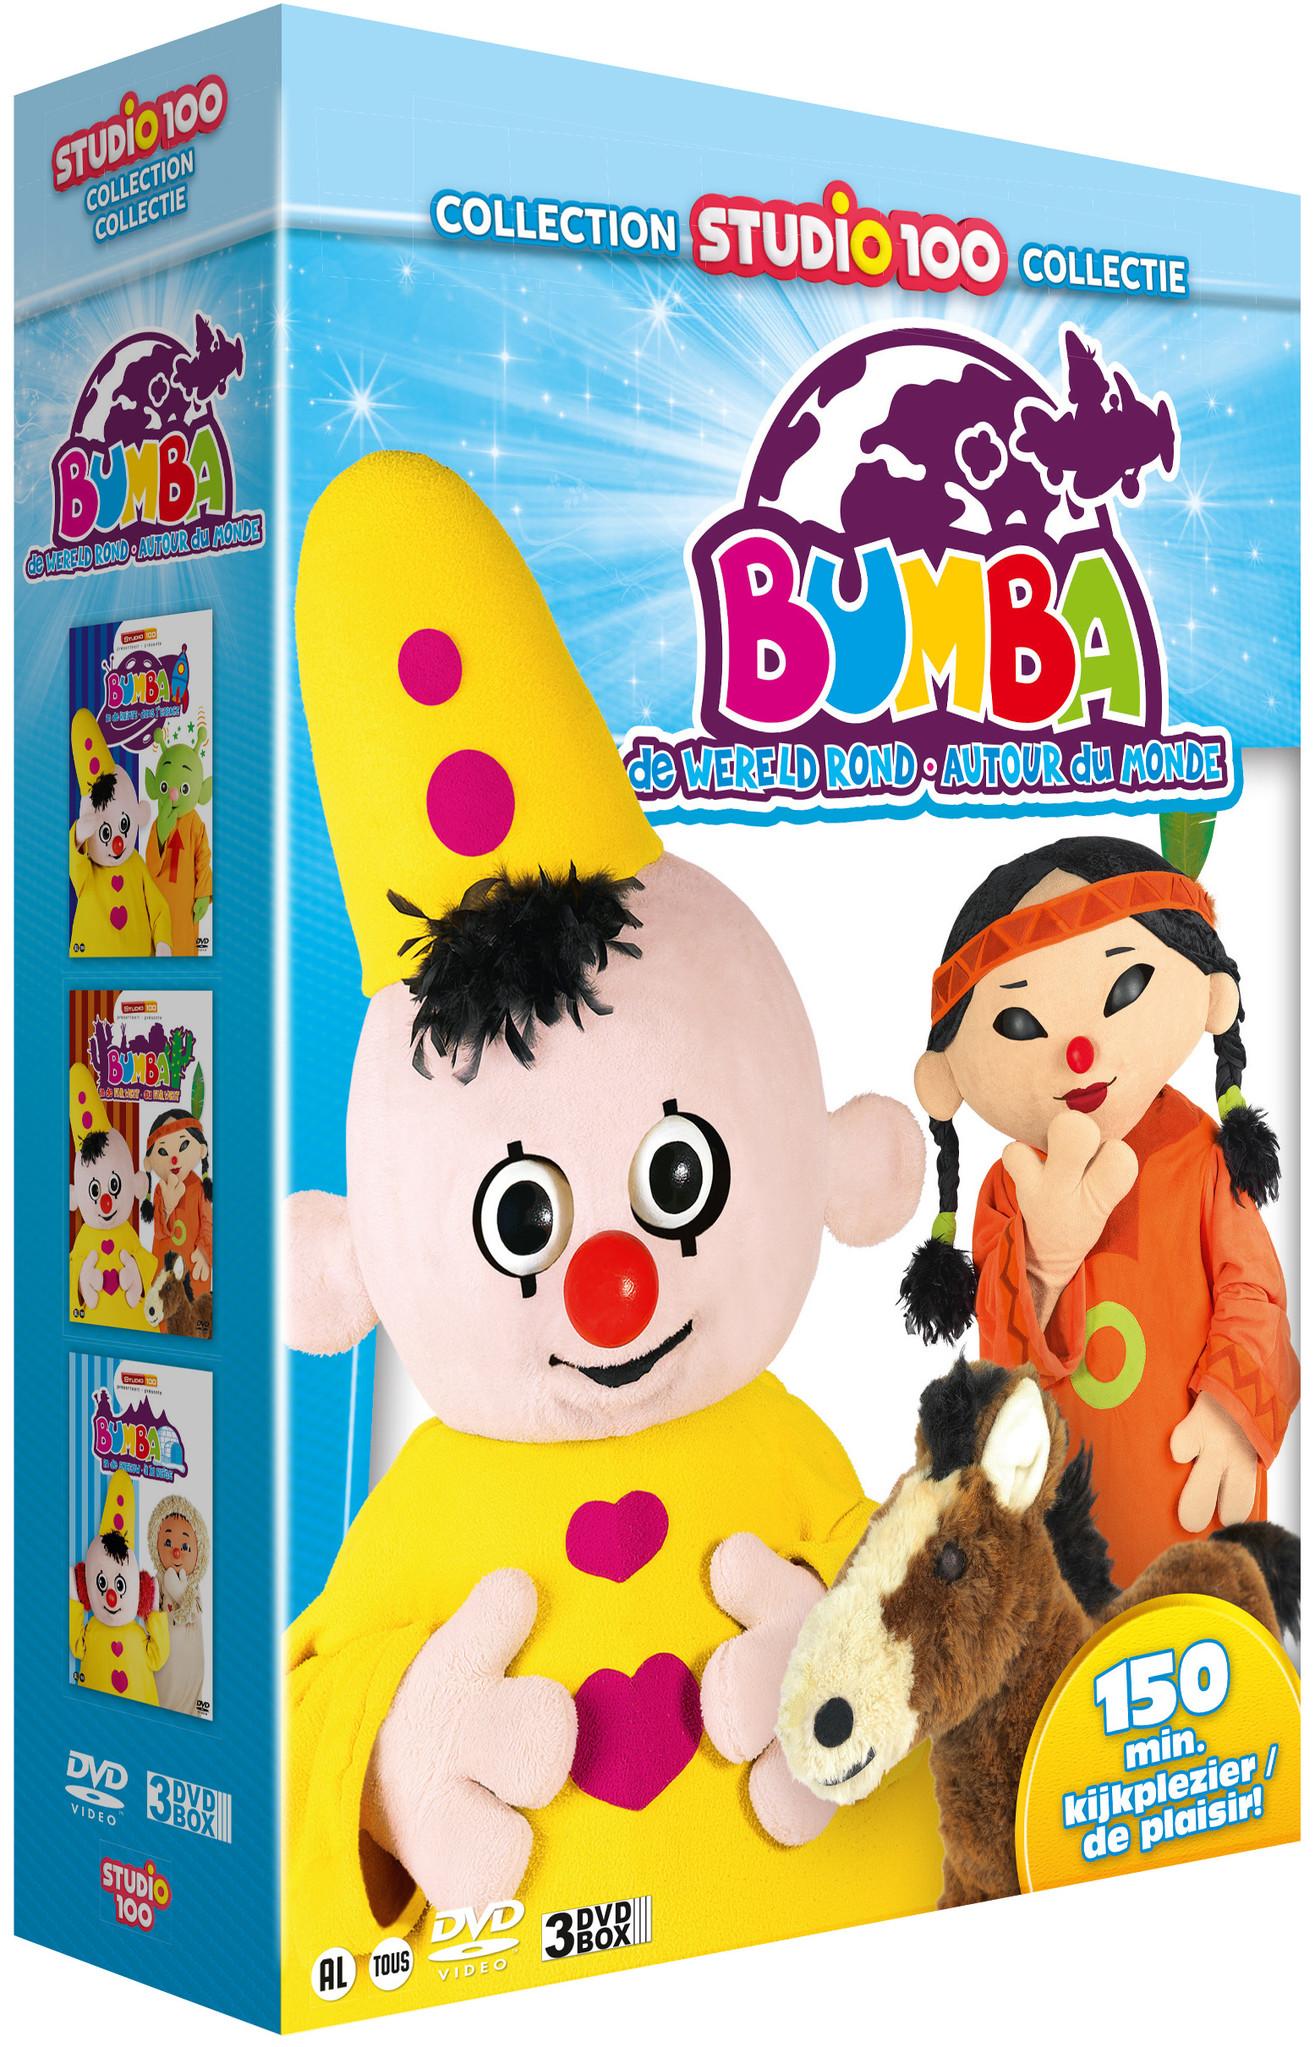 Dvd box Bumba: wereld rond vol. 2